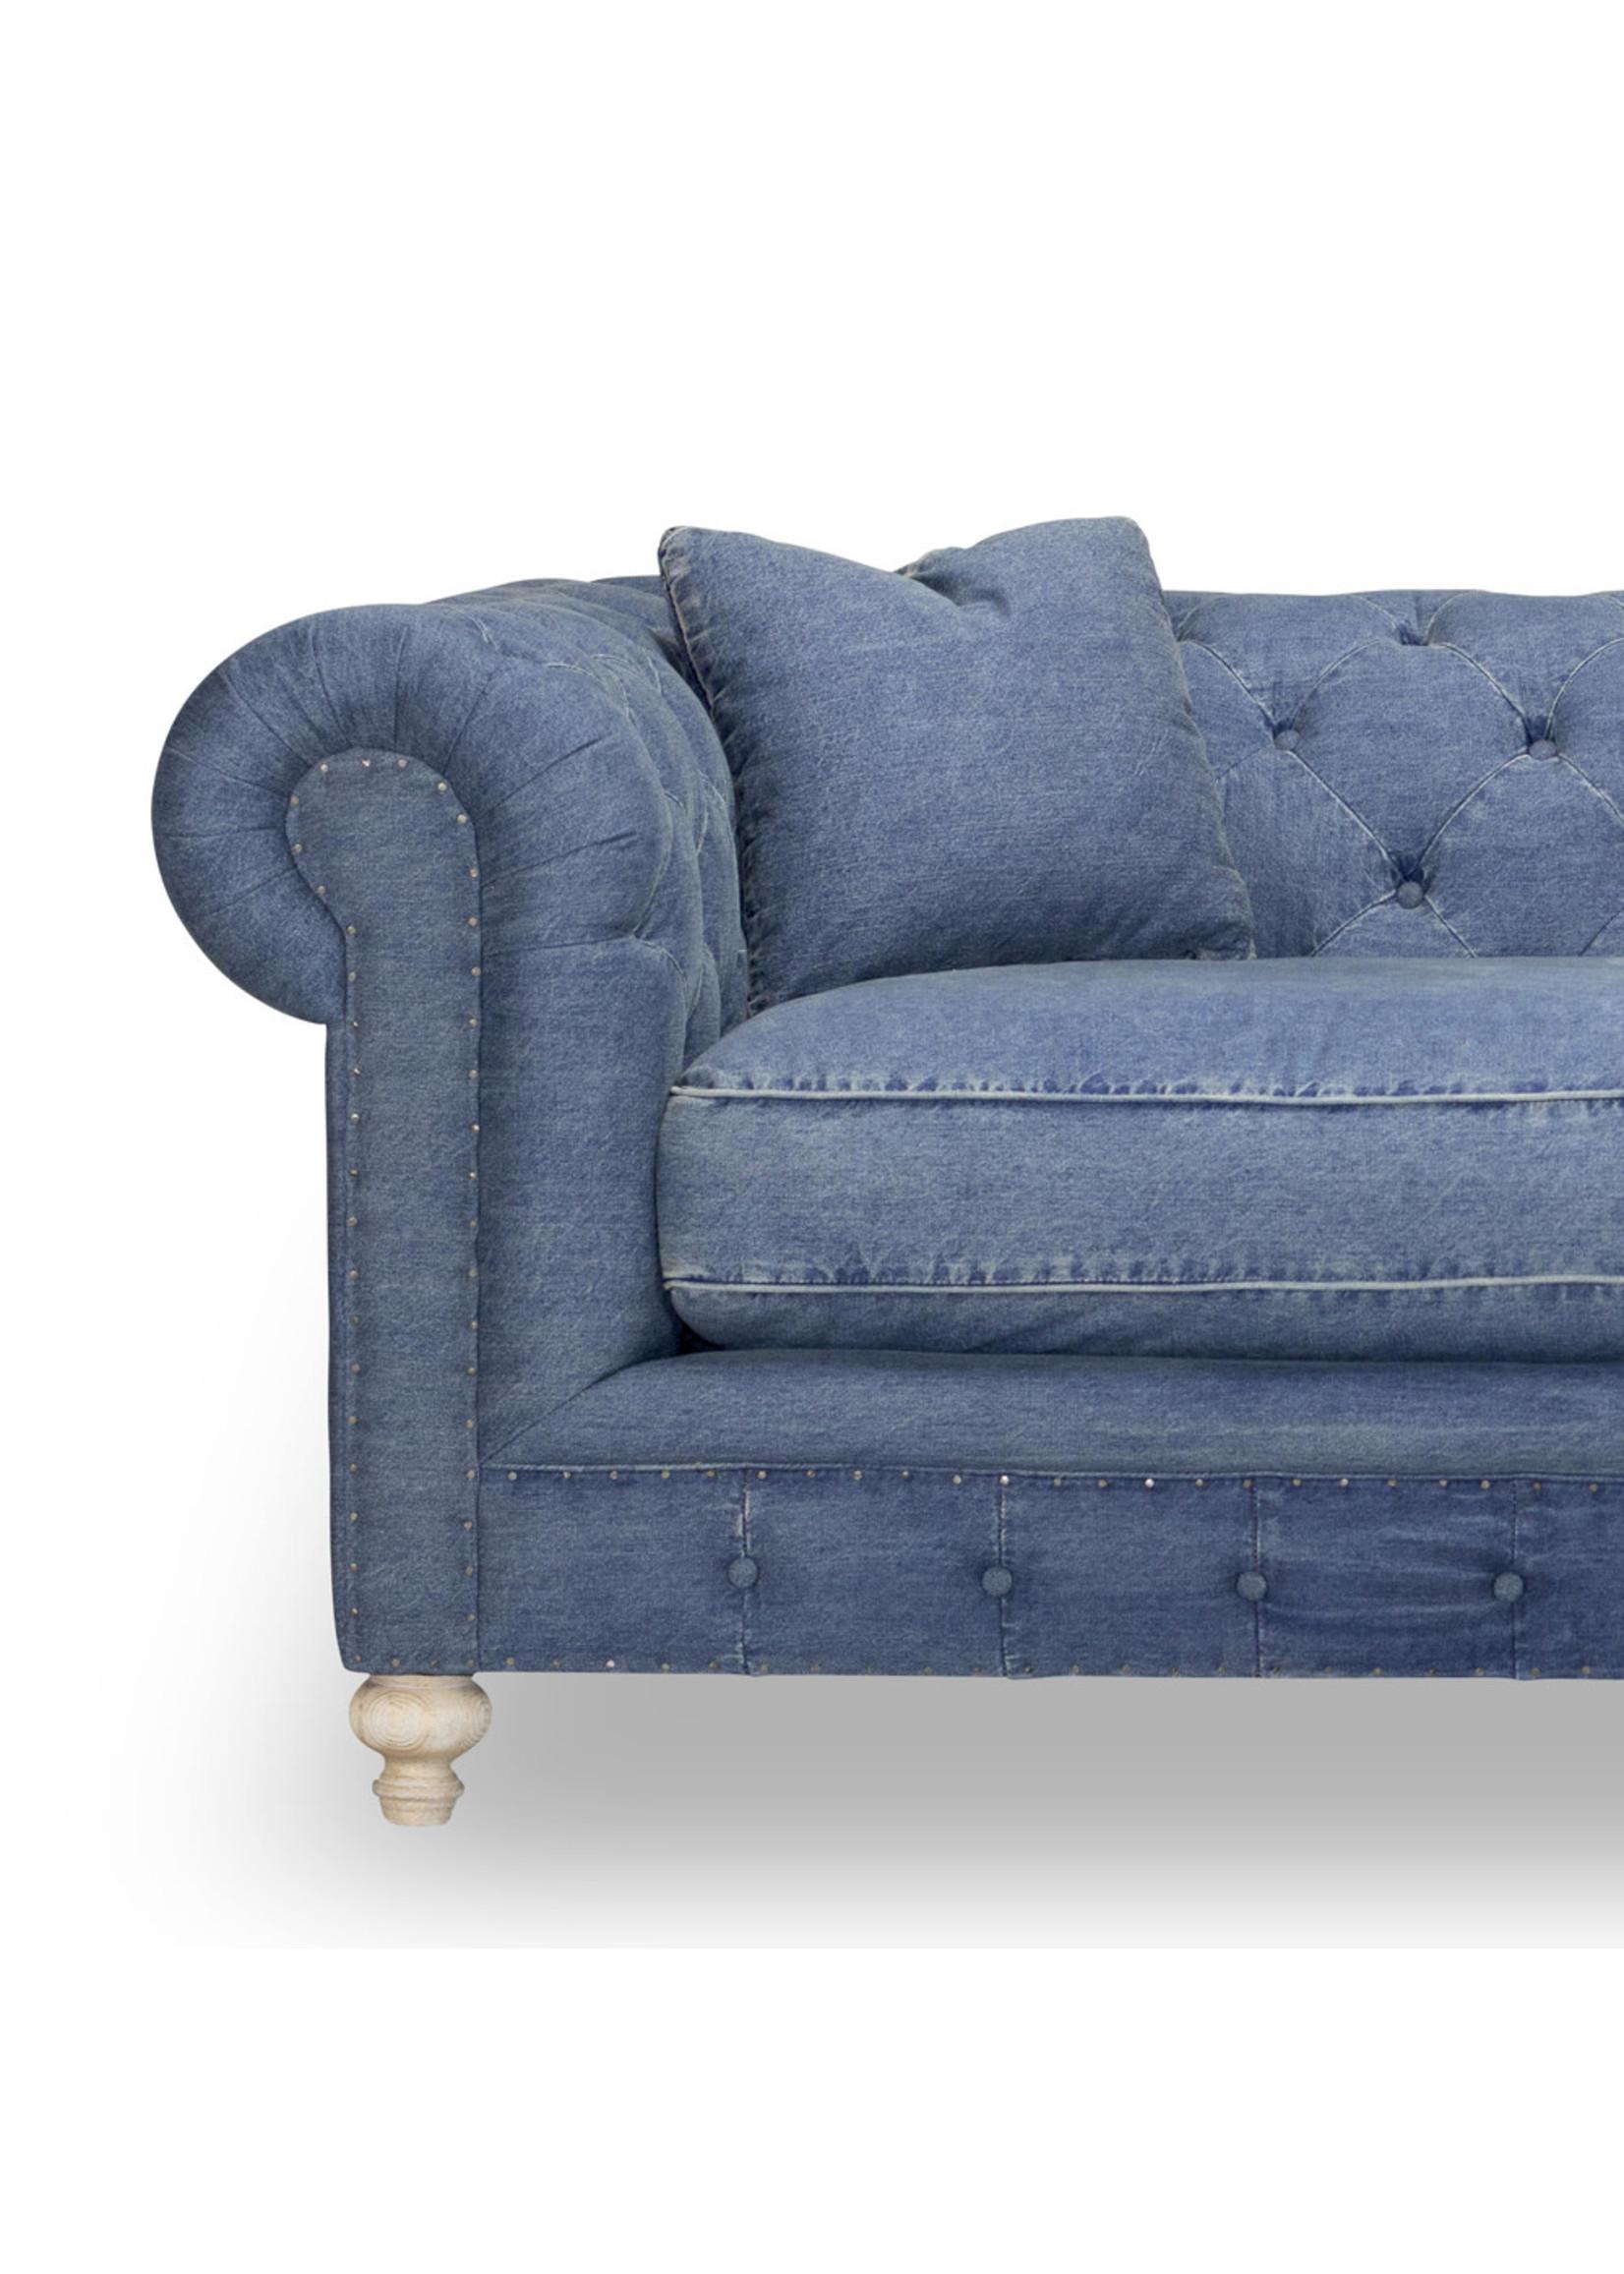 New Chesterfield Sofa in Denim SP